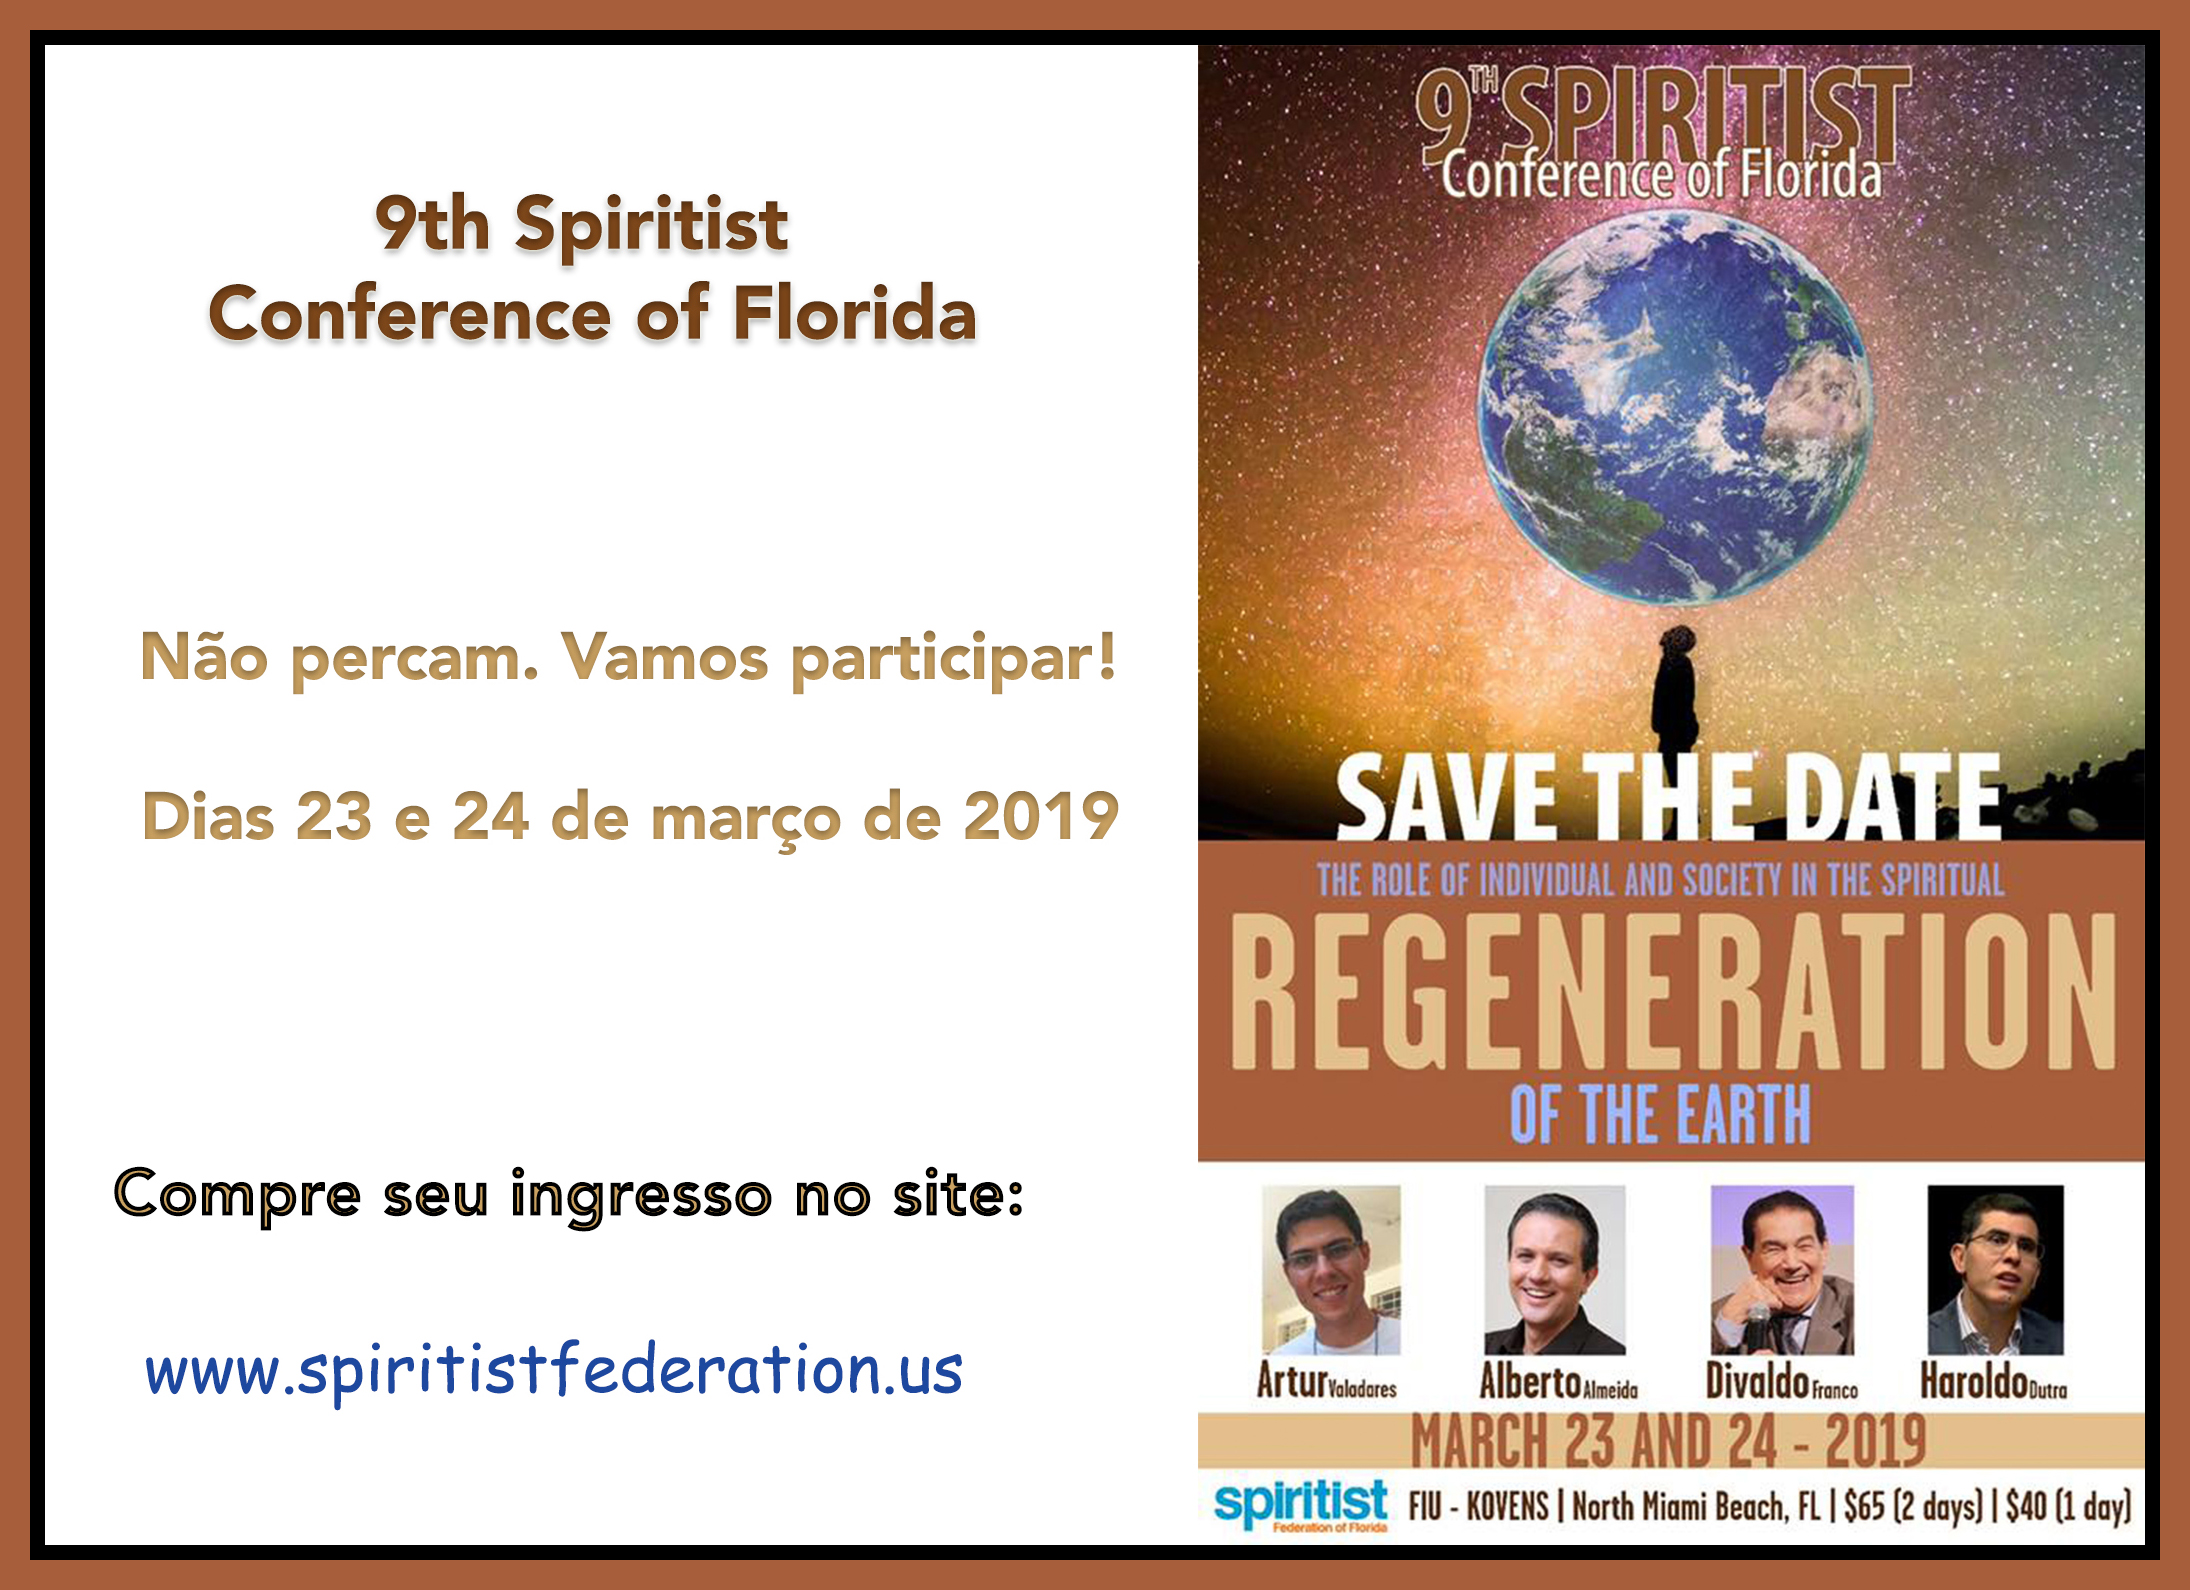 (th Spiritist Conference of Florida framed